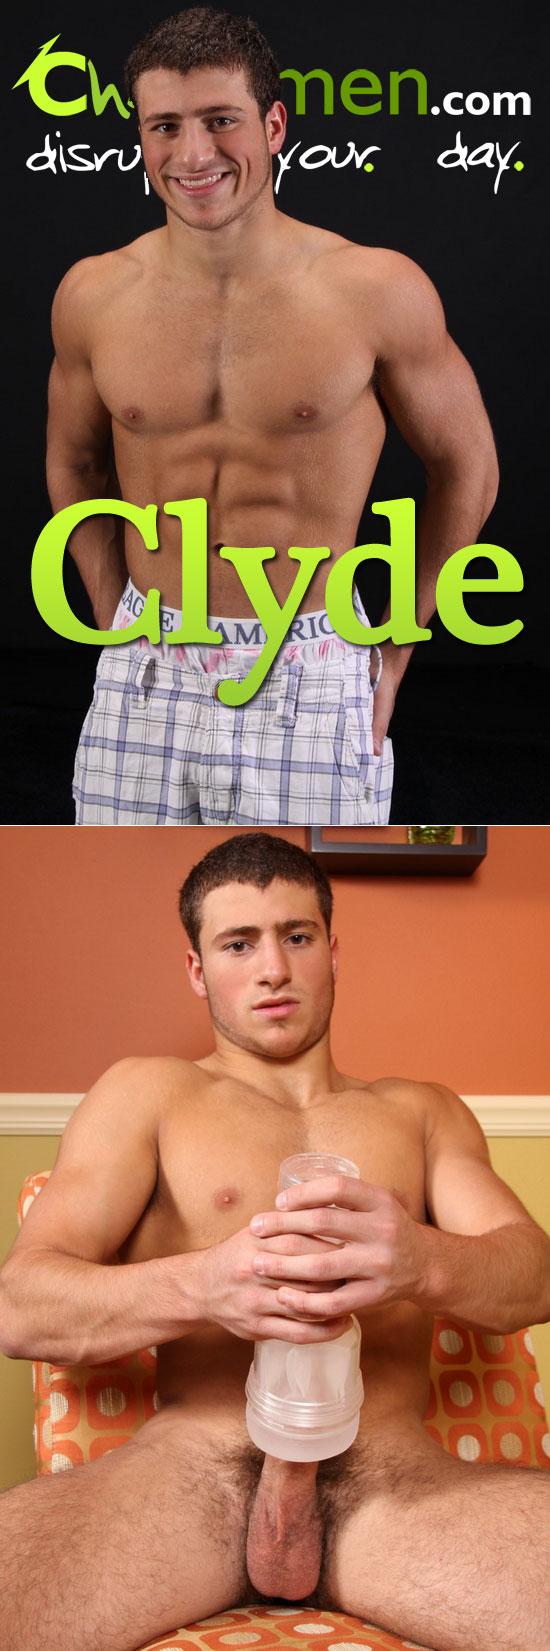 Clyde for Chaosmen